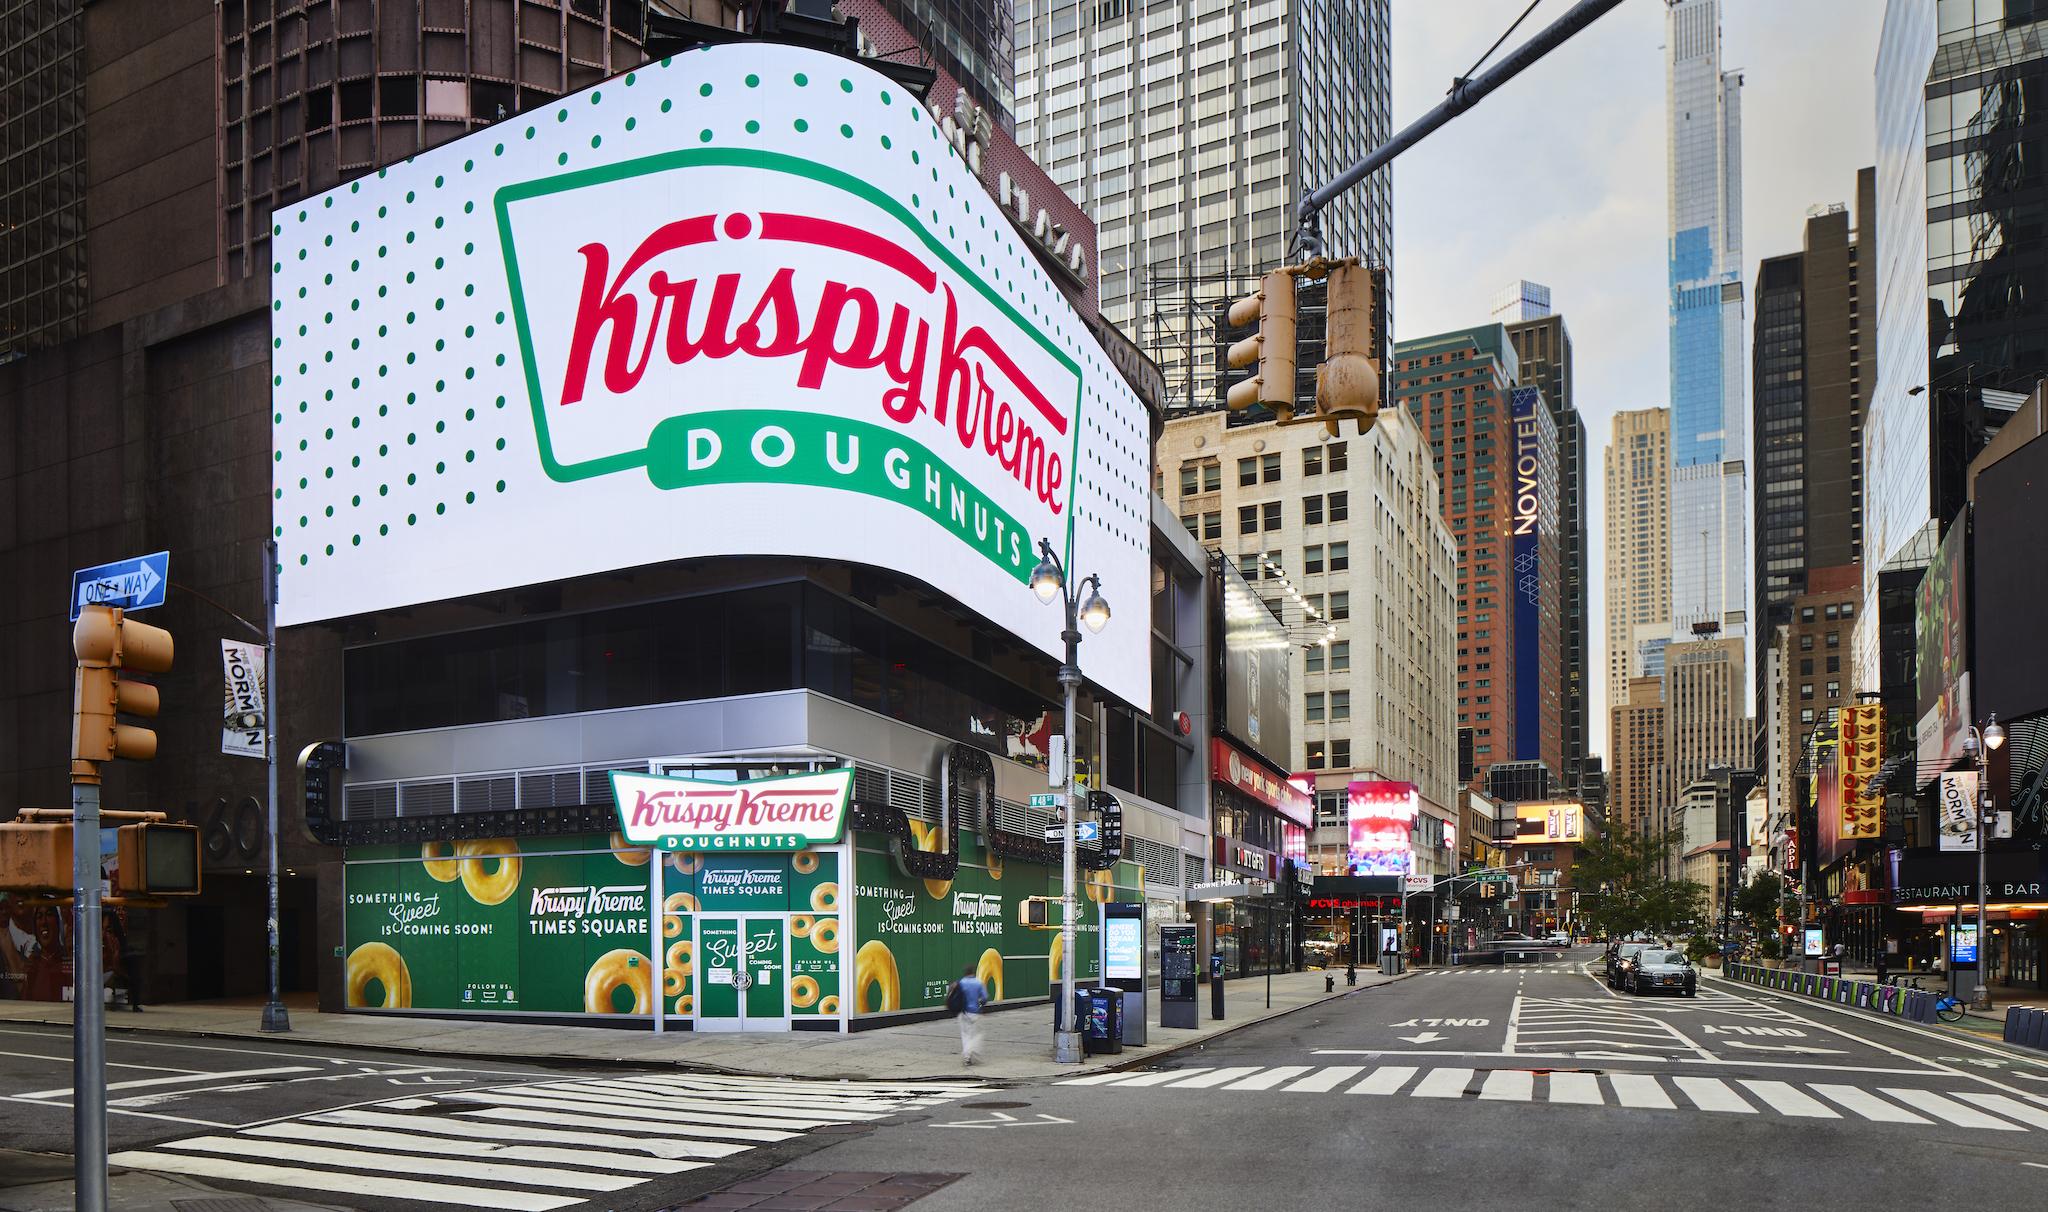 Krispy Kreme is releasing an exclusive doughnut to celebrate Broadway's reopening